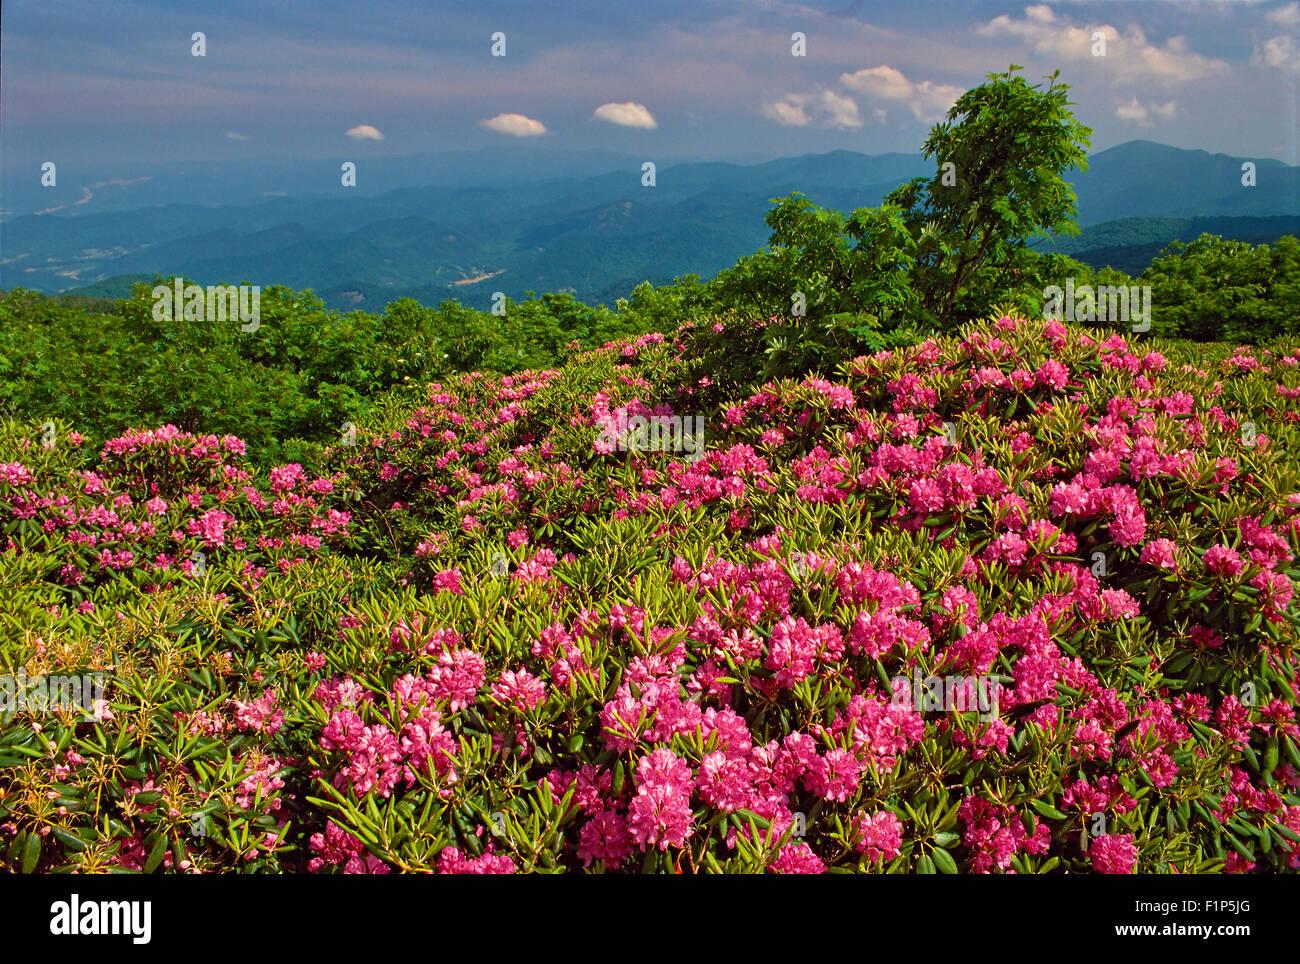 Wild Rhododendron, Craggy Gardens, Blue Ridge Parkway, North Carolina, USA - Stock Image